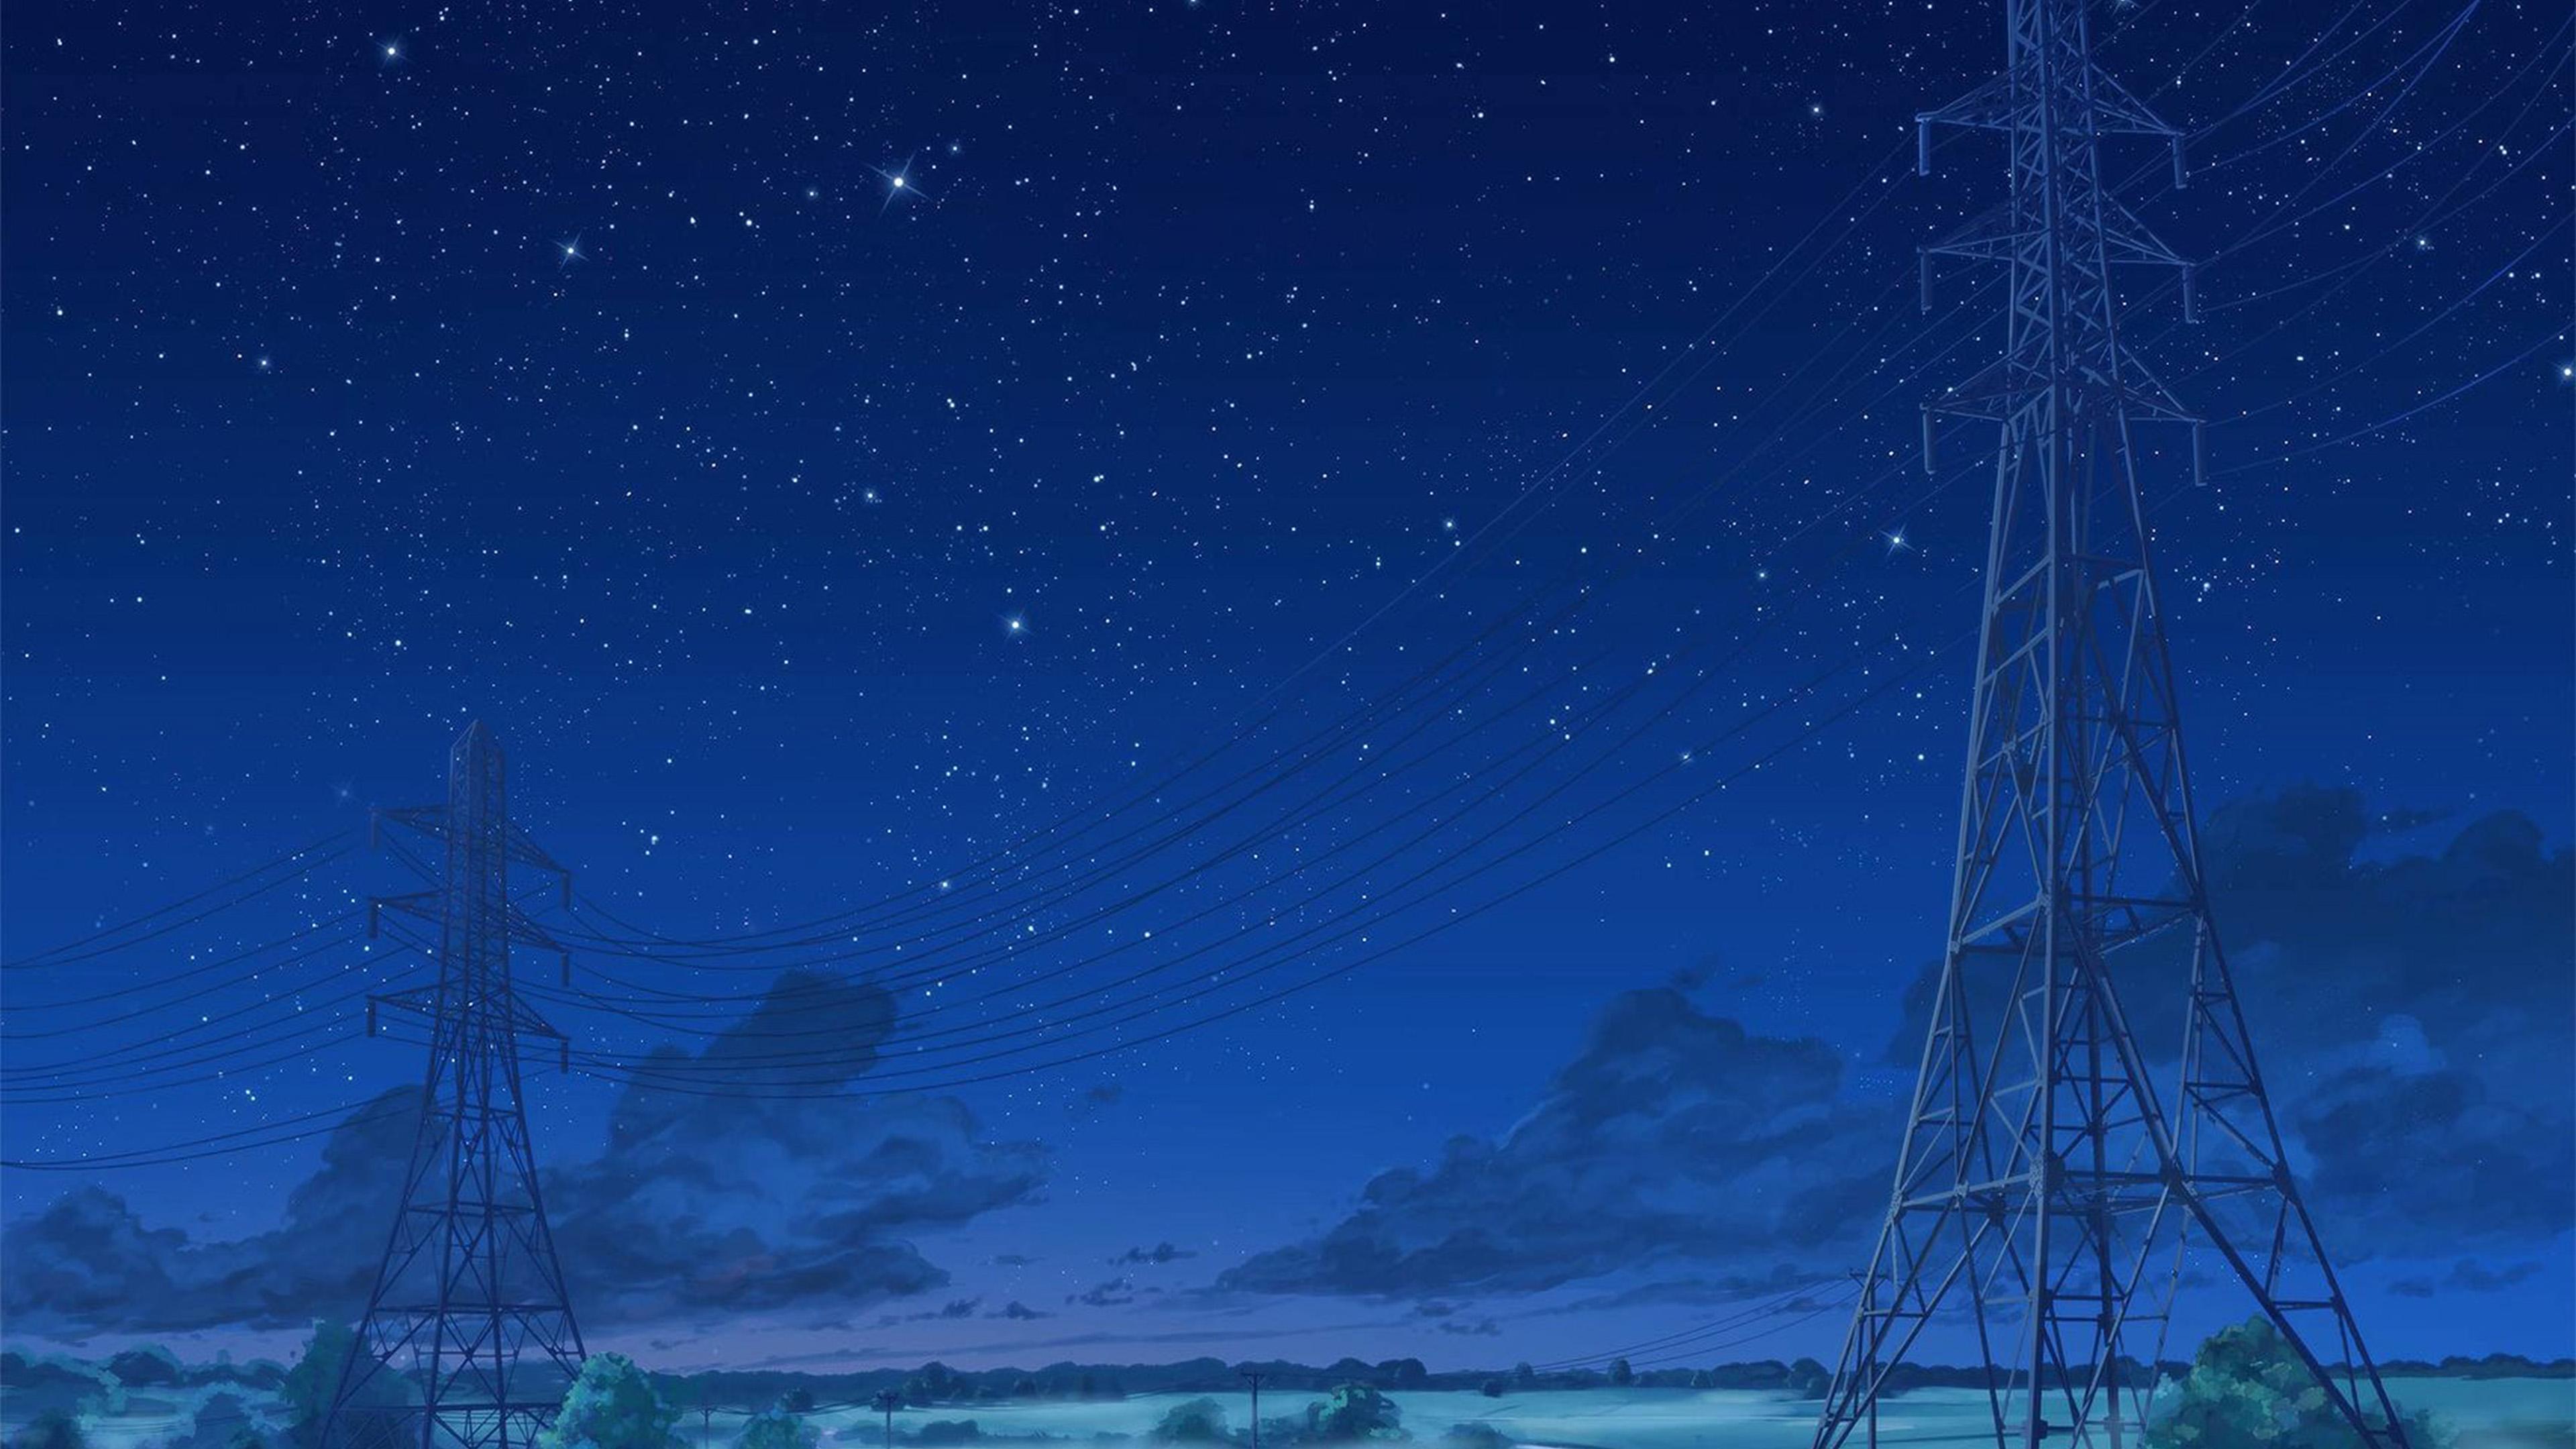 Aw15 Arseniy Chebynkin Night Sky Star Blue Illustration Art Anime Wallpaper